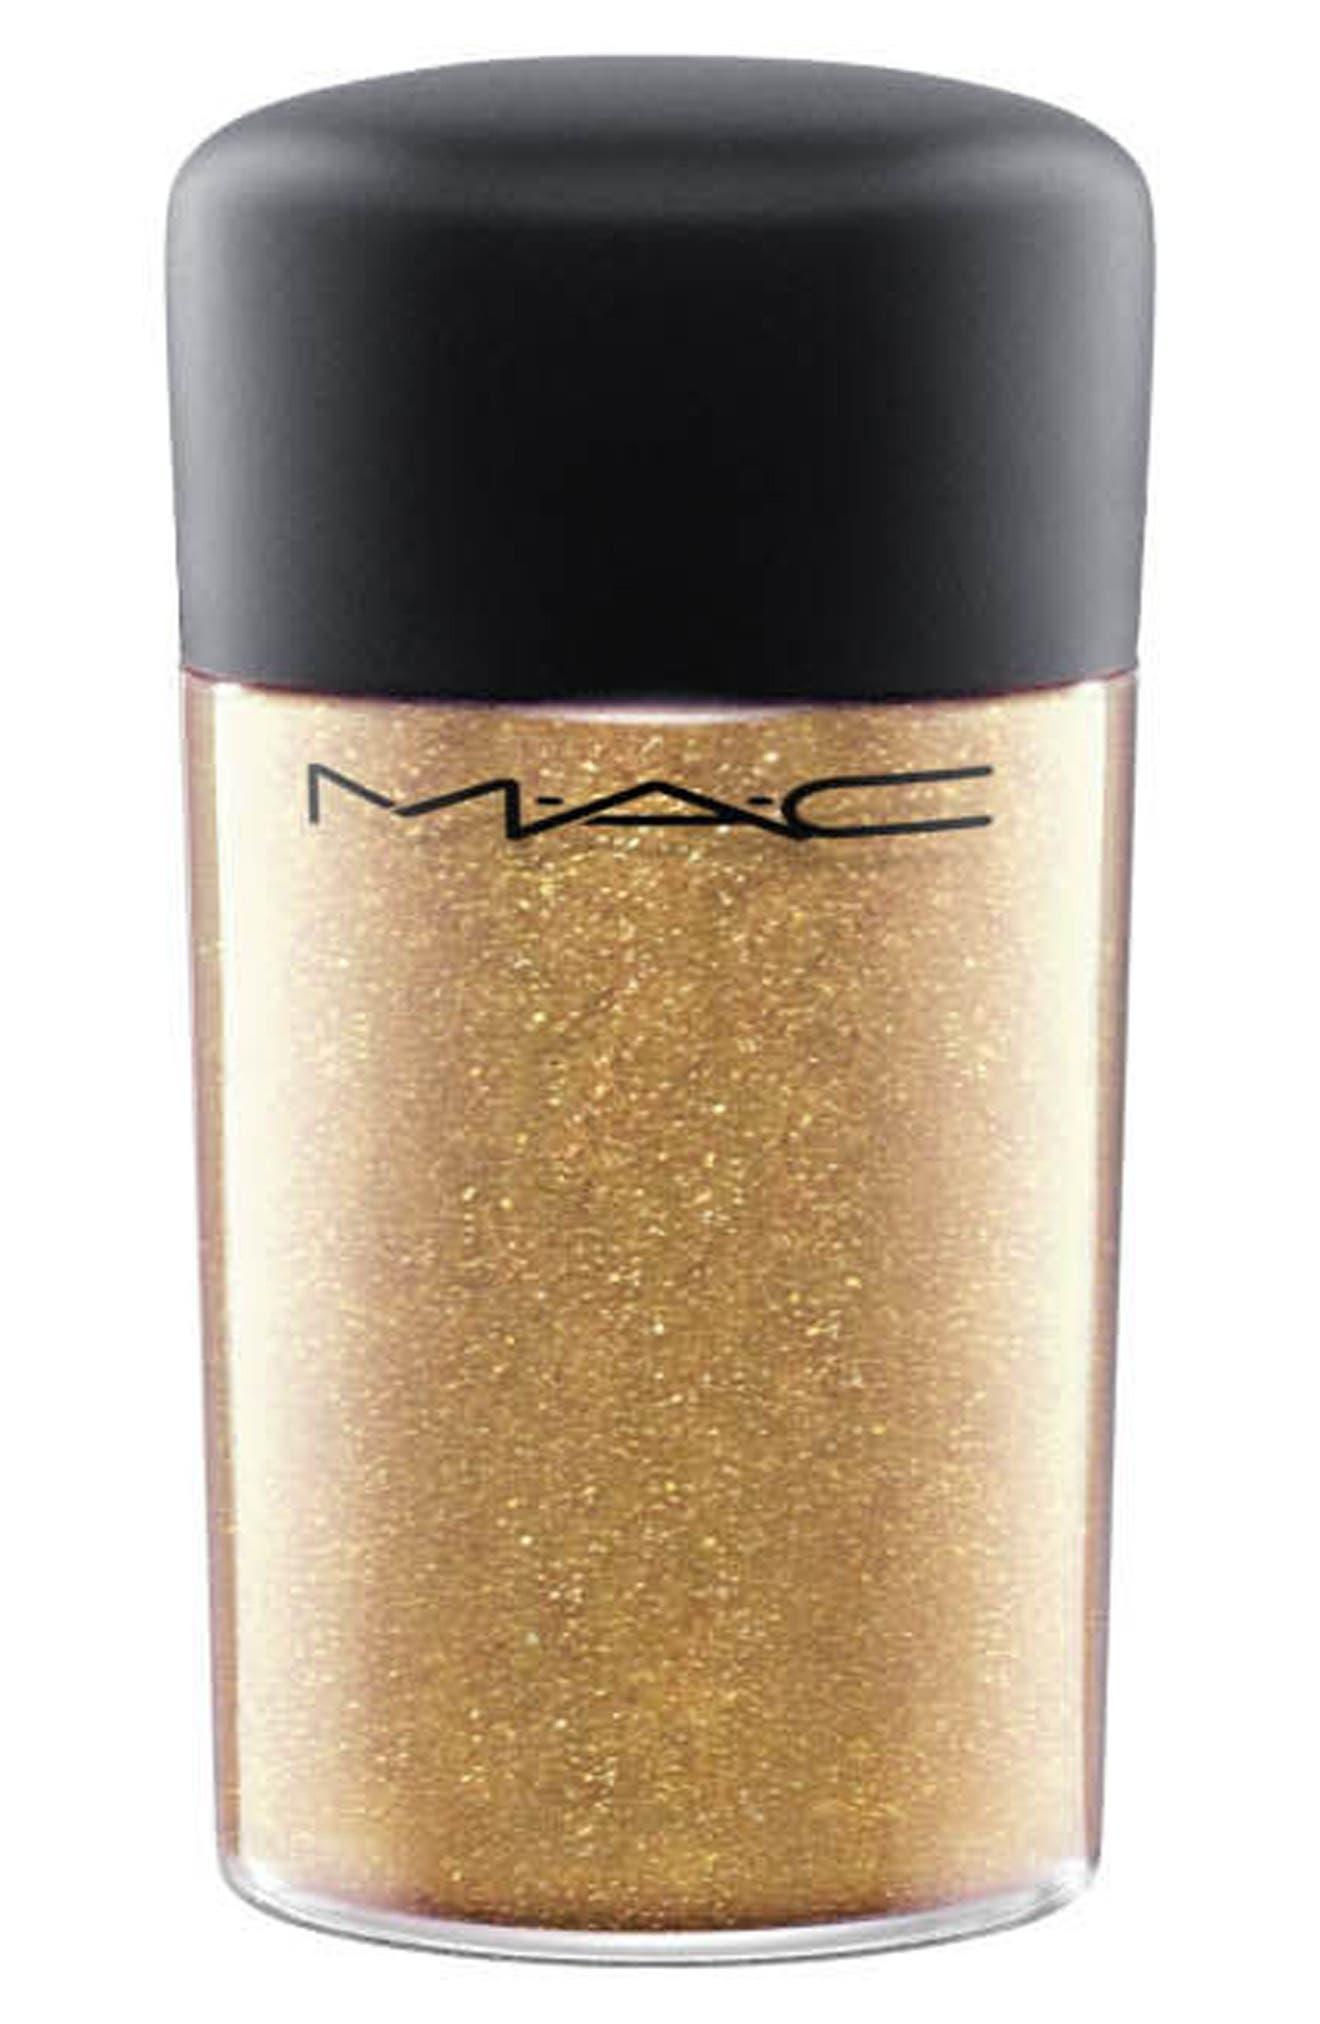 MAC Pro Pigments,                             Main thumbnail 1, color,                             Gold